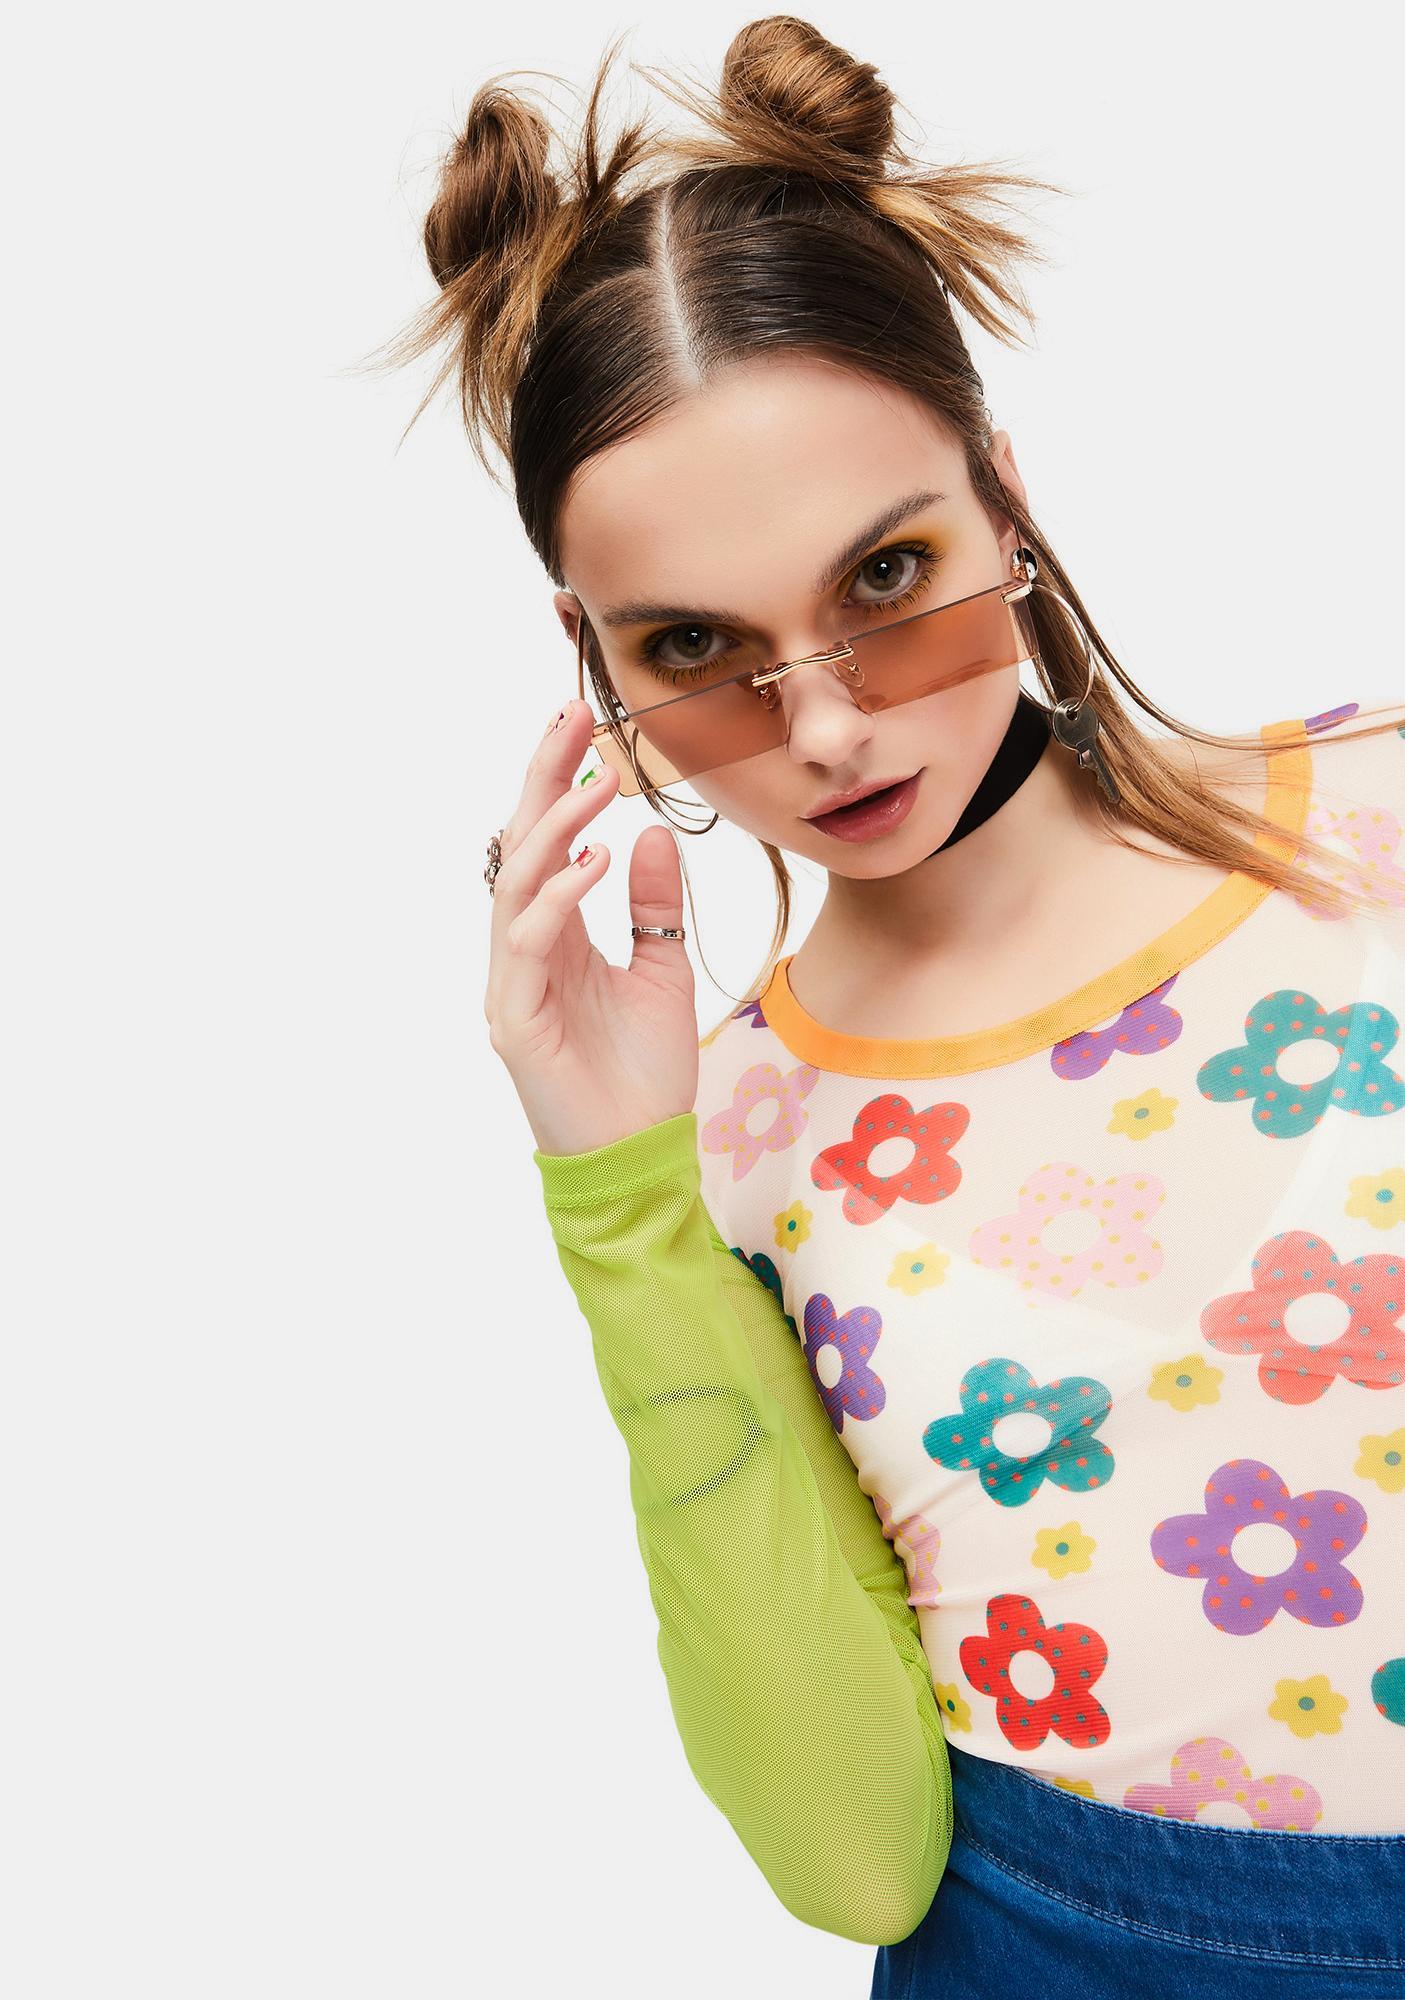 Crush Lil Bit Shady Frameless Rectangle Sunglasses